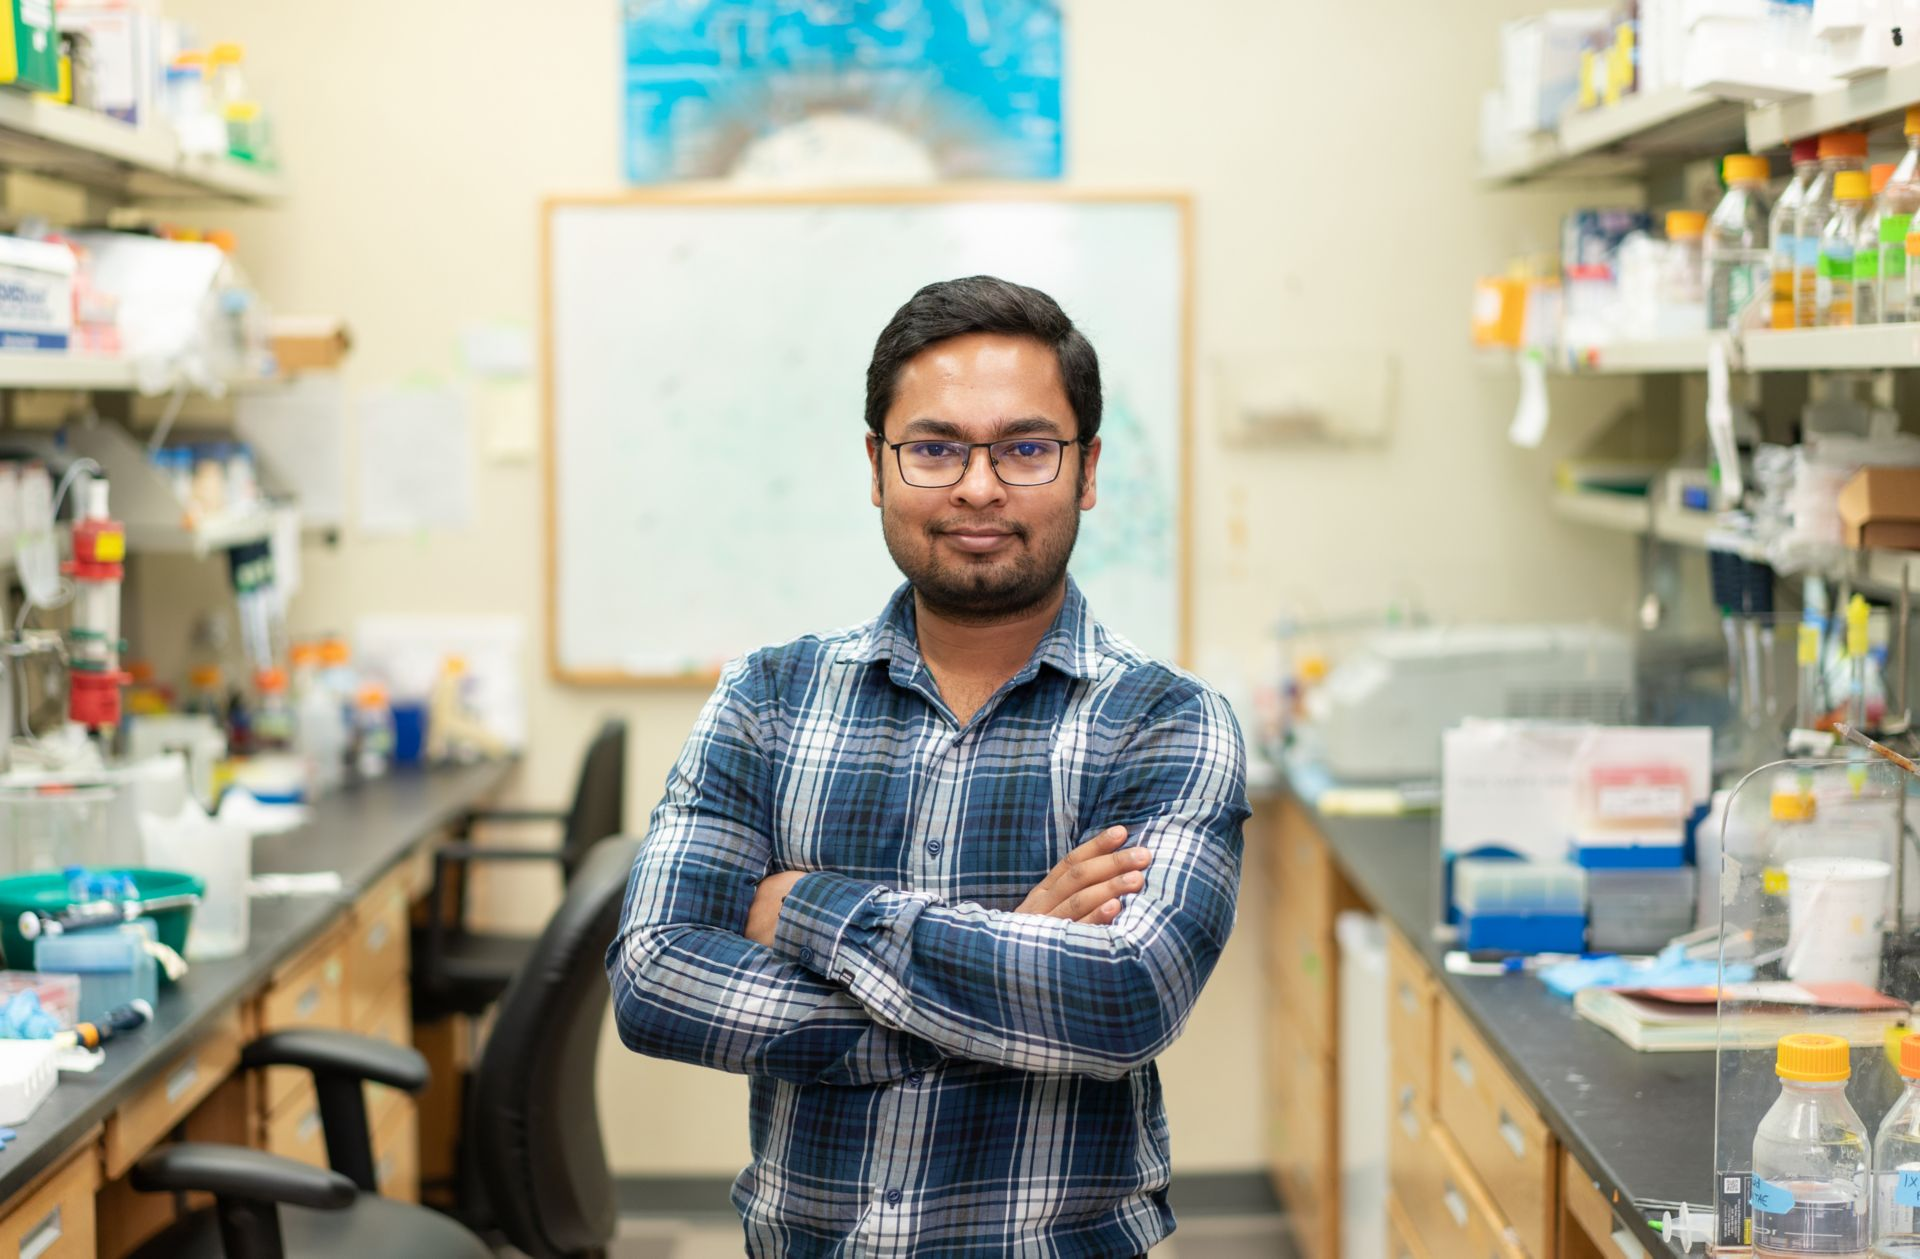 Bappaditya Chandra, PhD